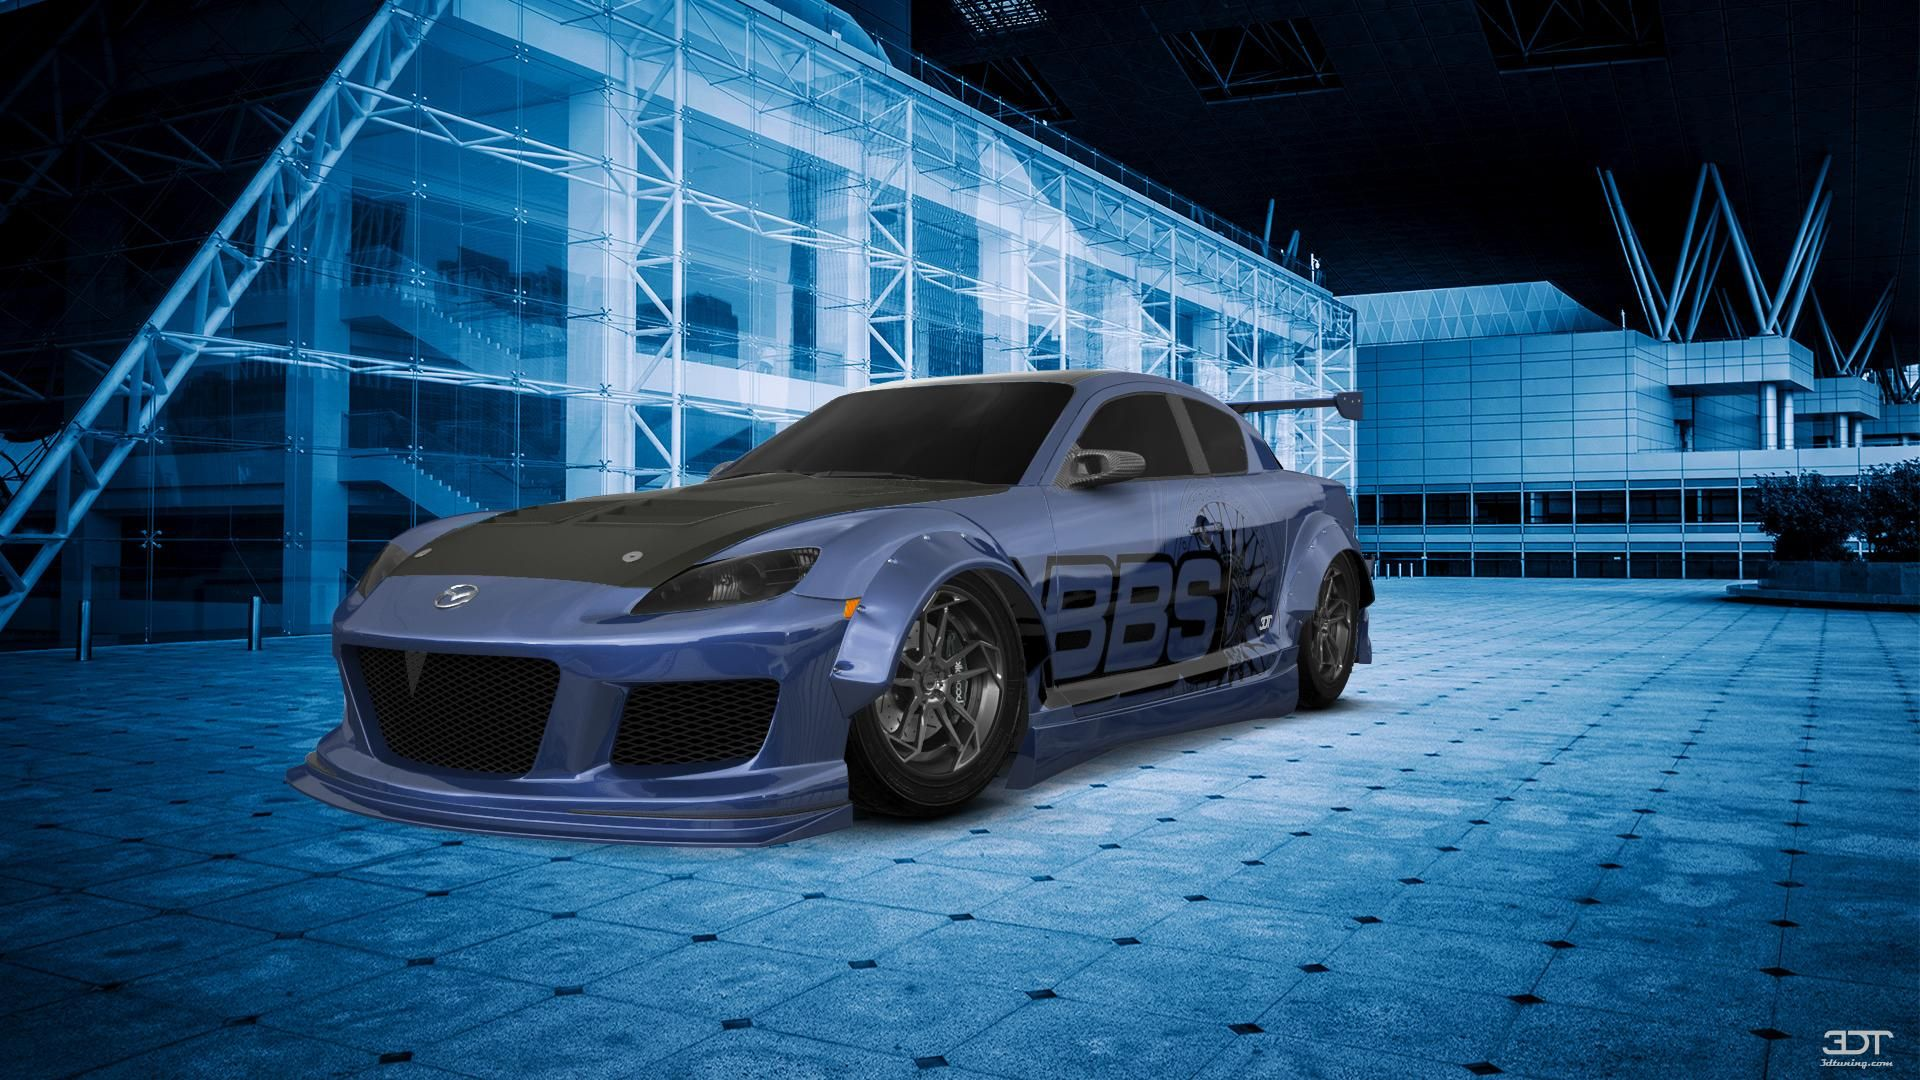 Checkout My Tuning Mazda Rx 8 2004 At 3dtuning 3dtuning Tuning In 2020 Mazda Car Painting Sports Car